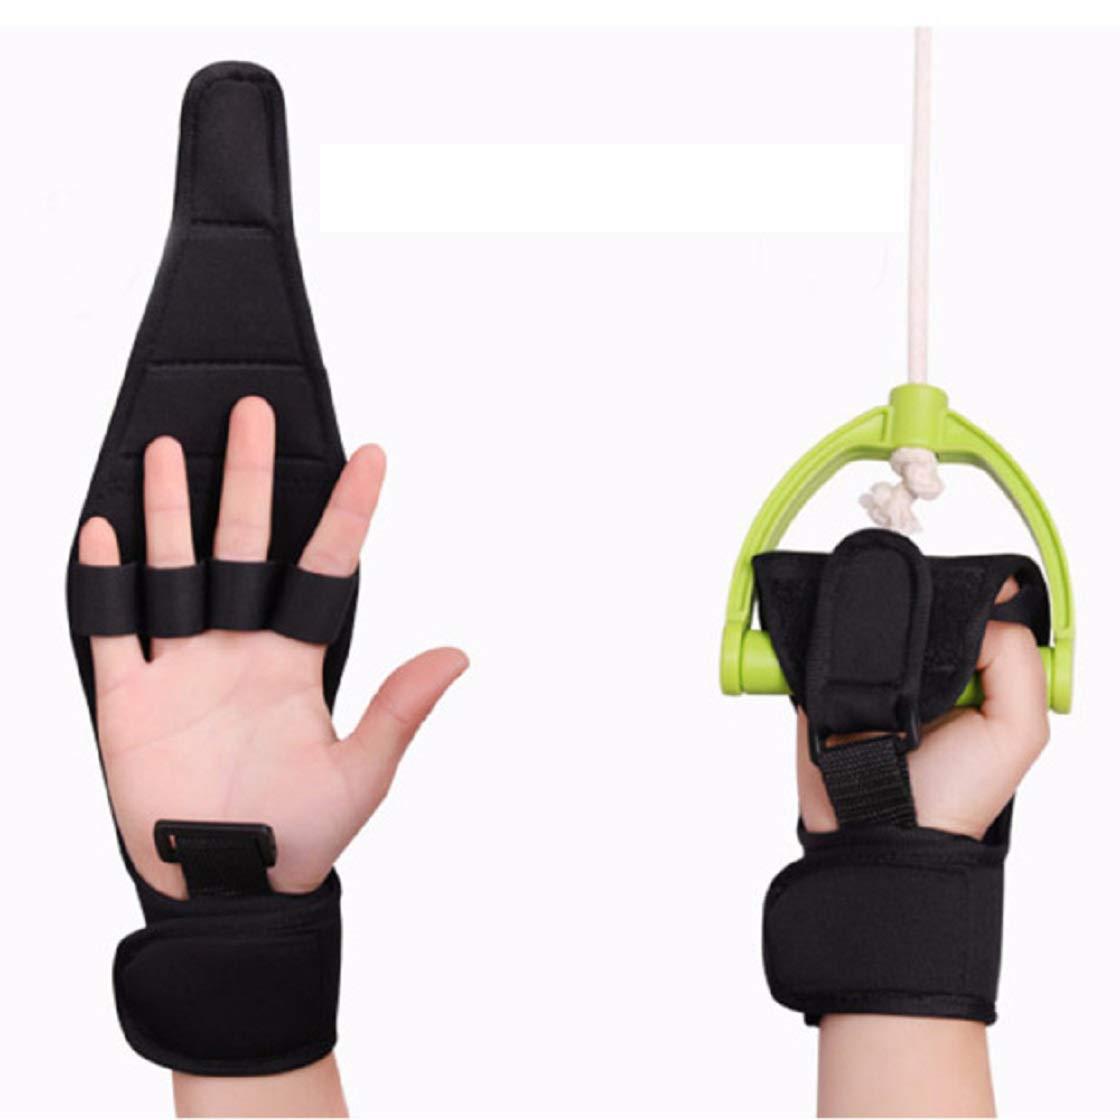 Jinon Finger Splint Brace ability,Finger Anti-Spasticity Rehabilitation Auxiliary Training Gloves For Stroke Hemiplegia Patient And Athlete Finger Rehabilitation [Single Hand Universal] (Black)